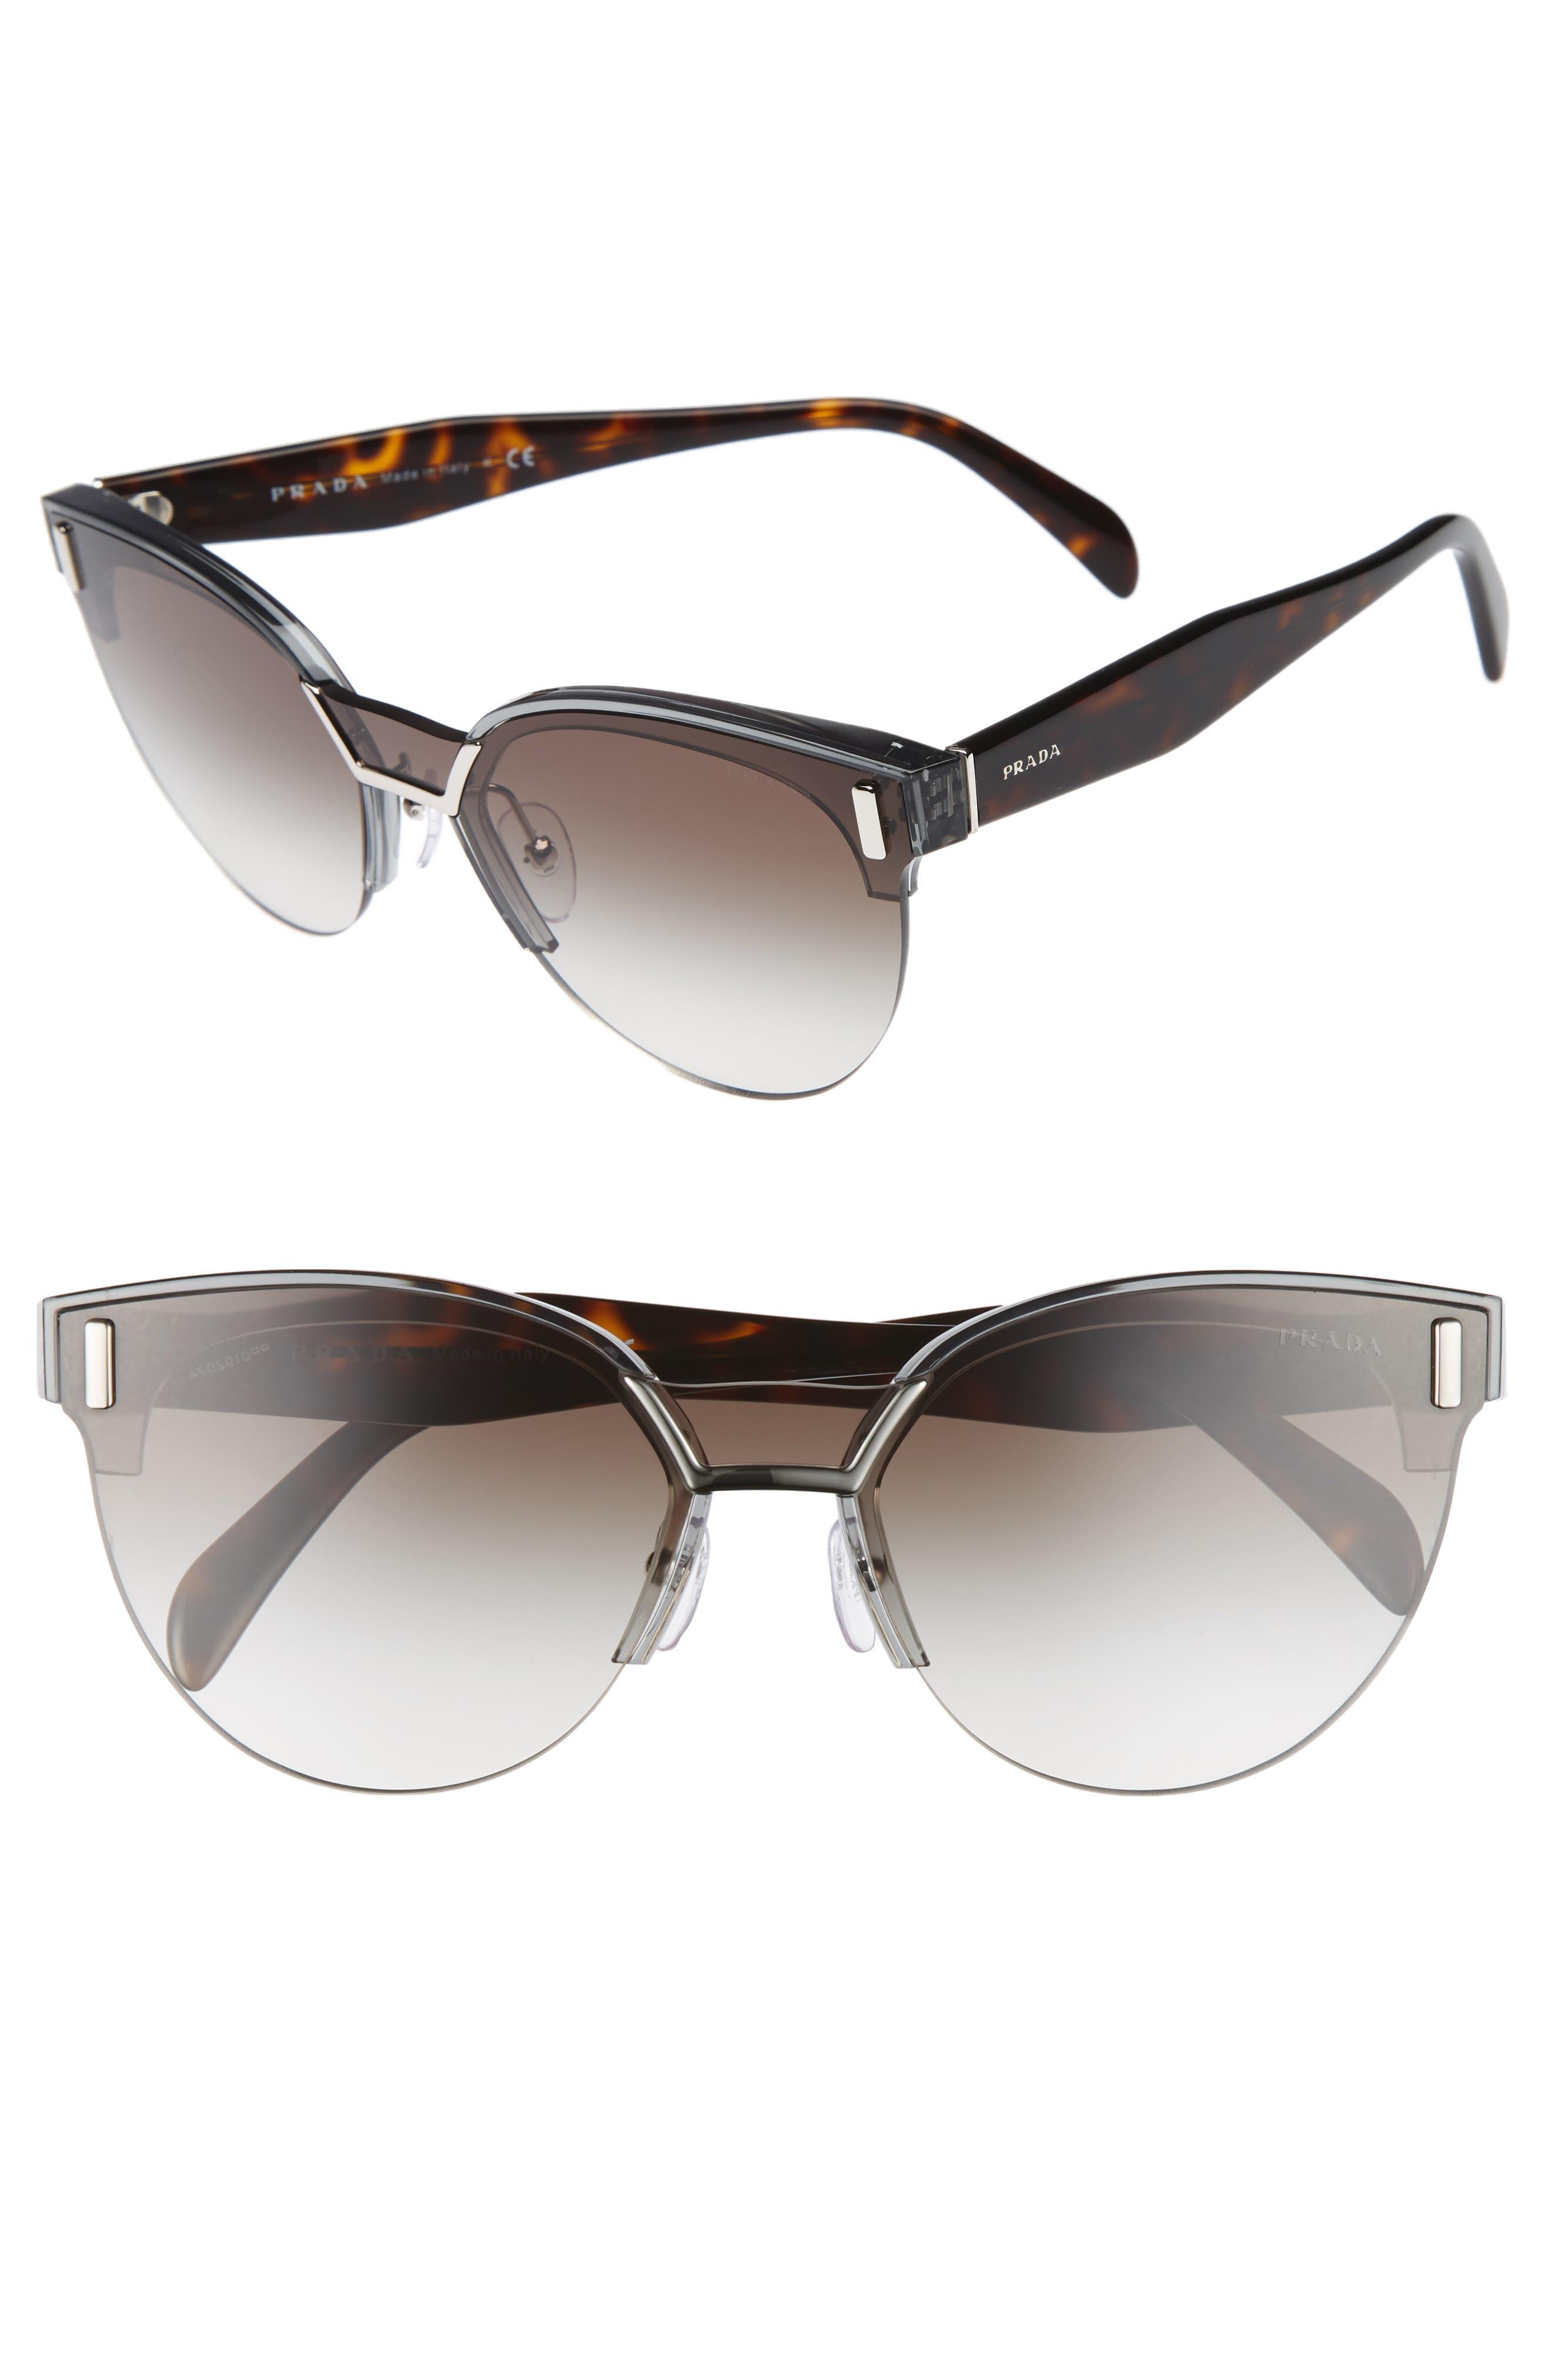 50mm Semi Rimless Gradient Sunglasses,                         Main,                         color, 025